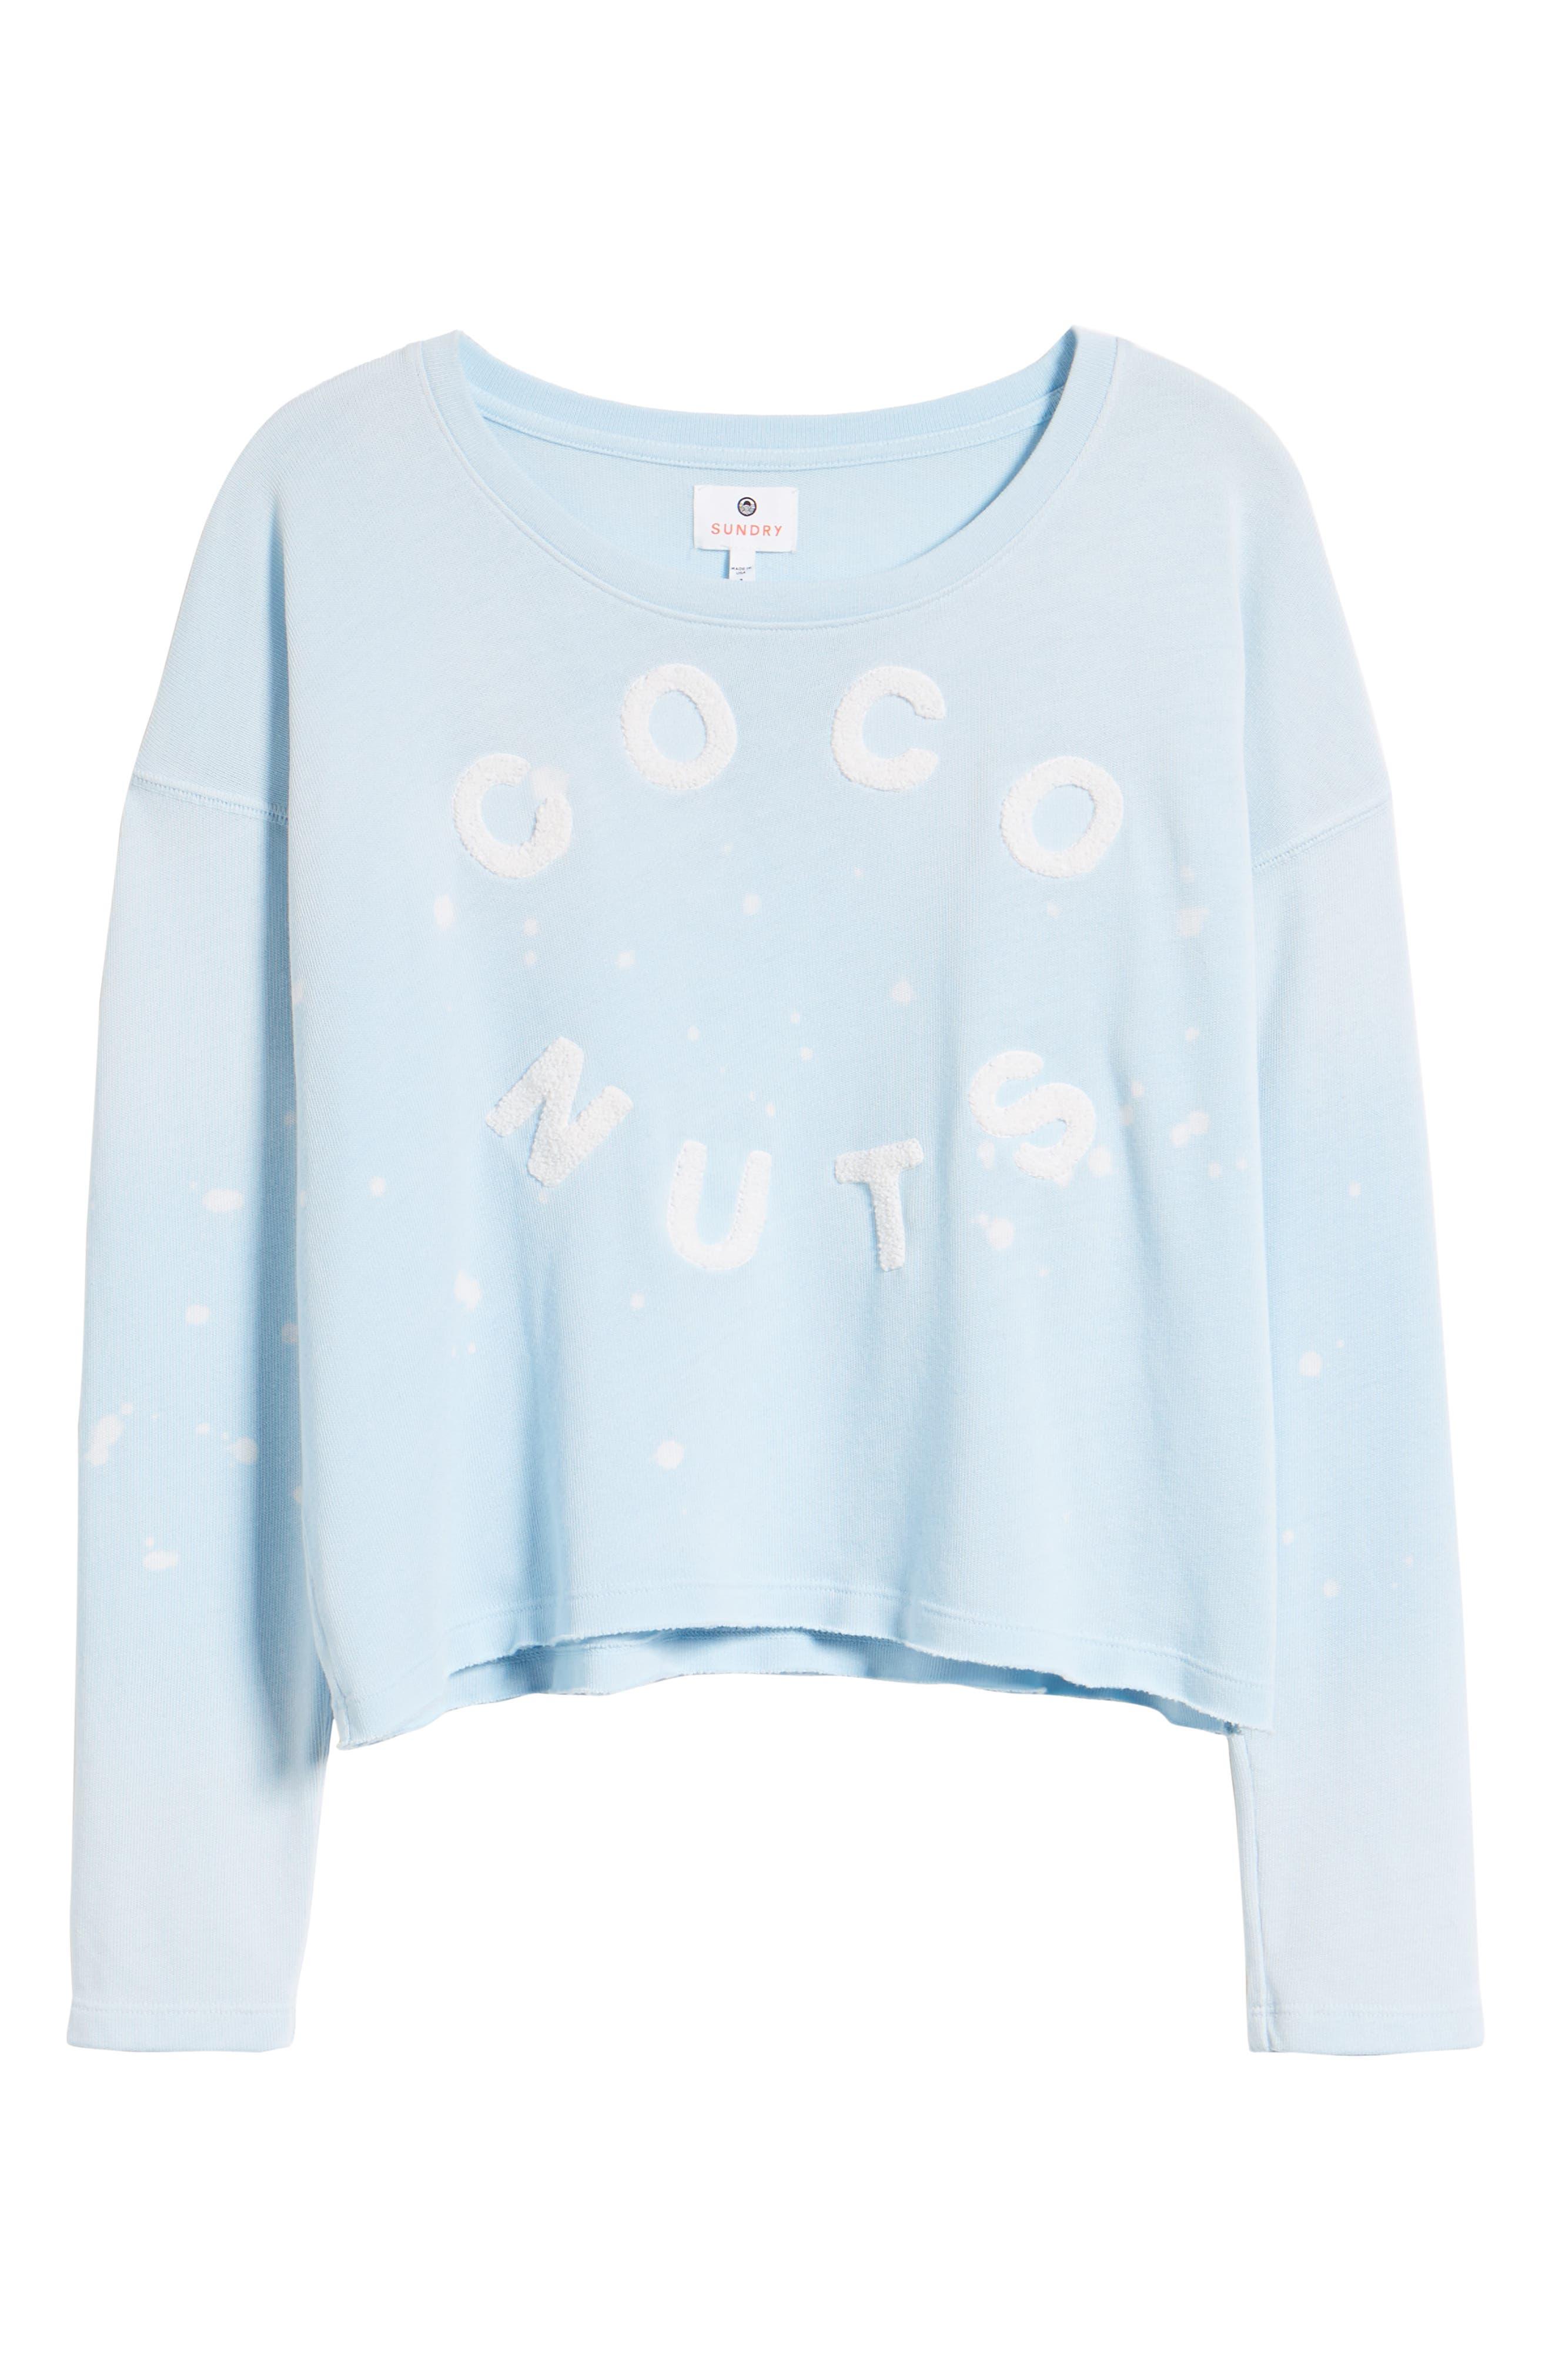 Coco Nuts Light Fleece Sweatshirt,                             Alternate thumbnail 7, color,                             Sun Faded Sky